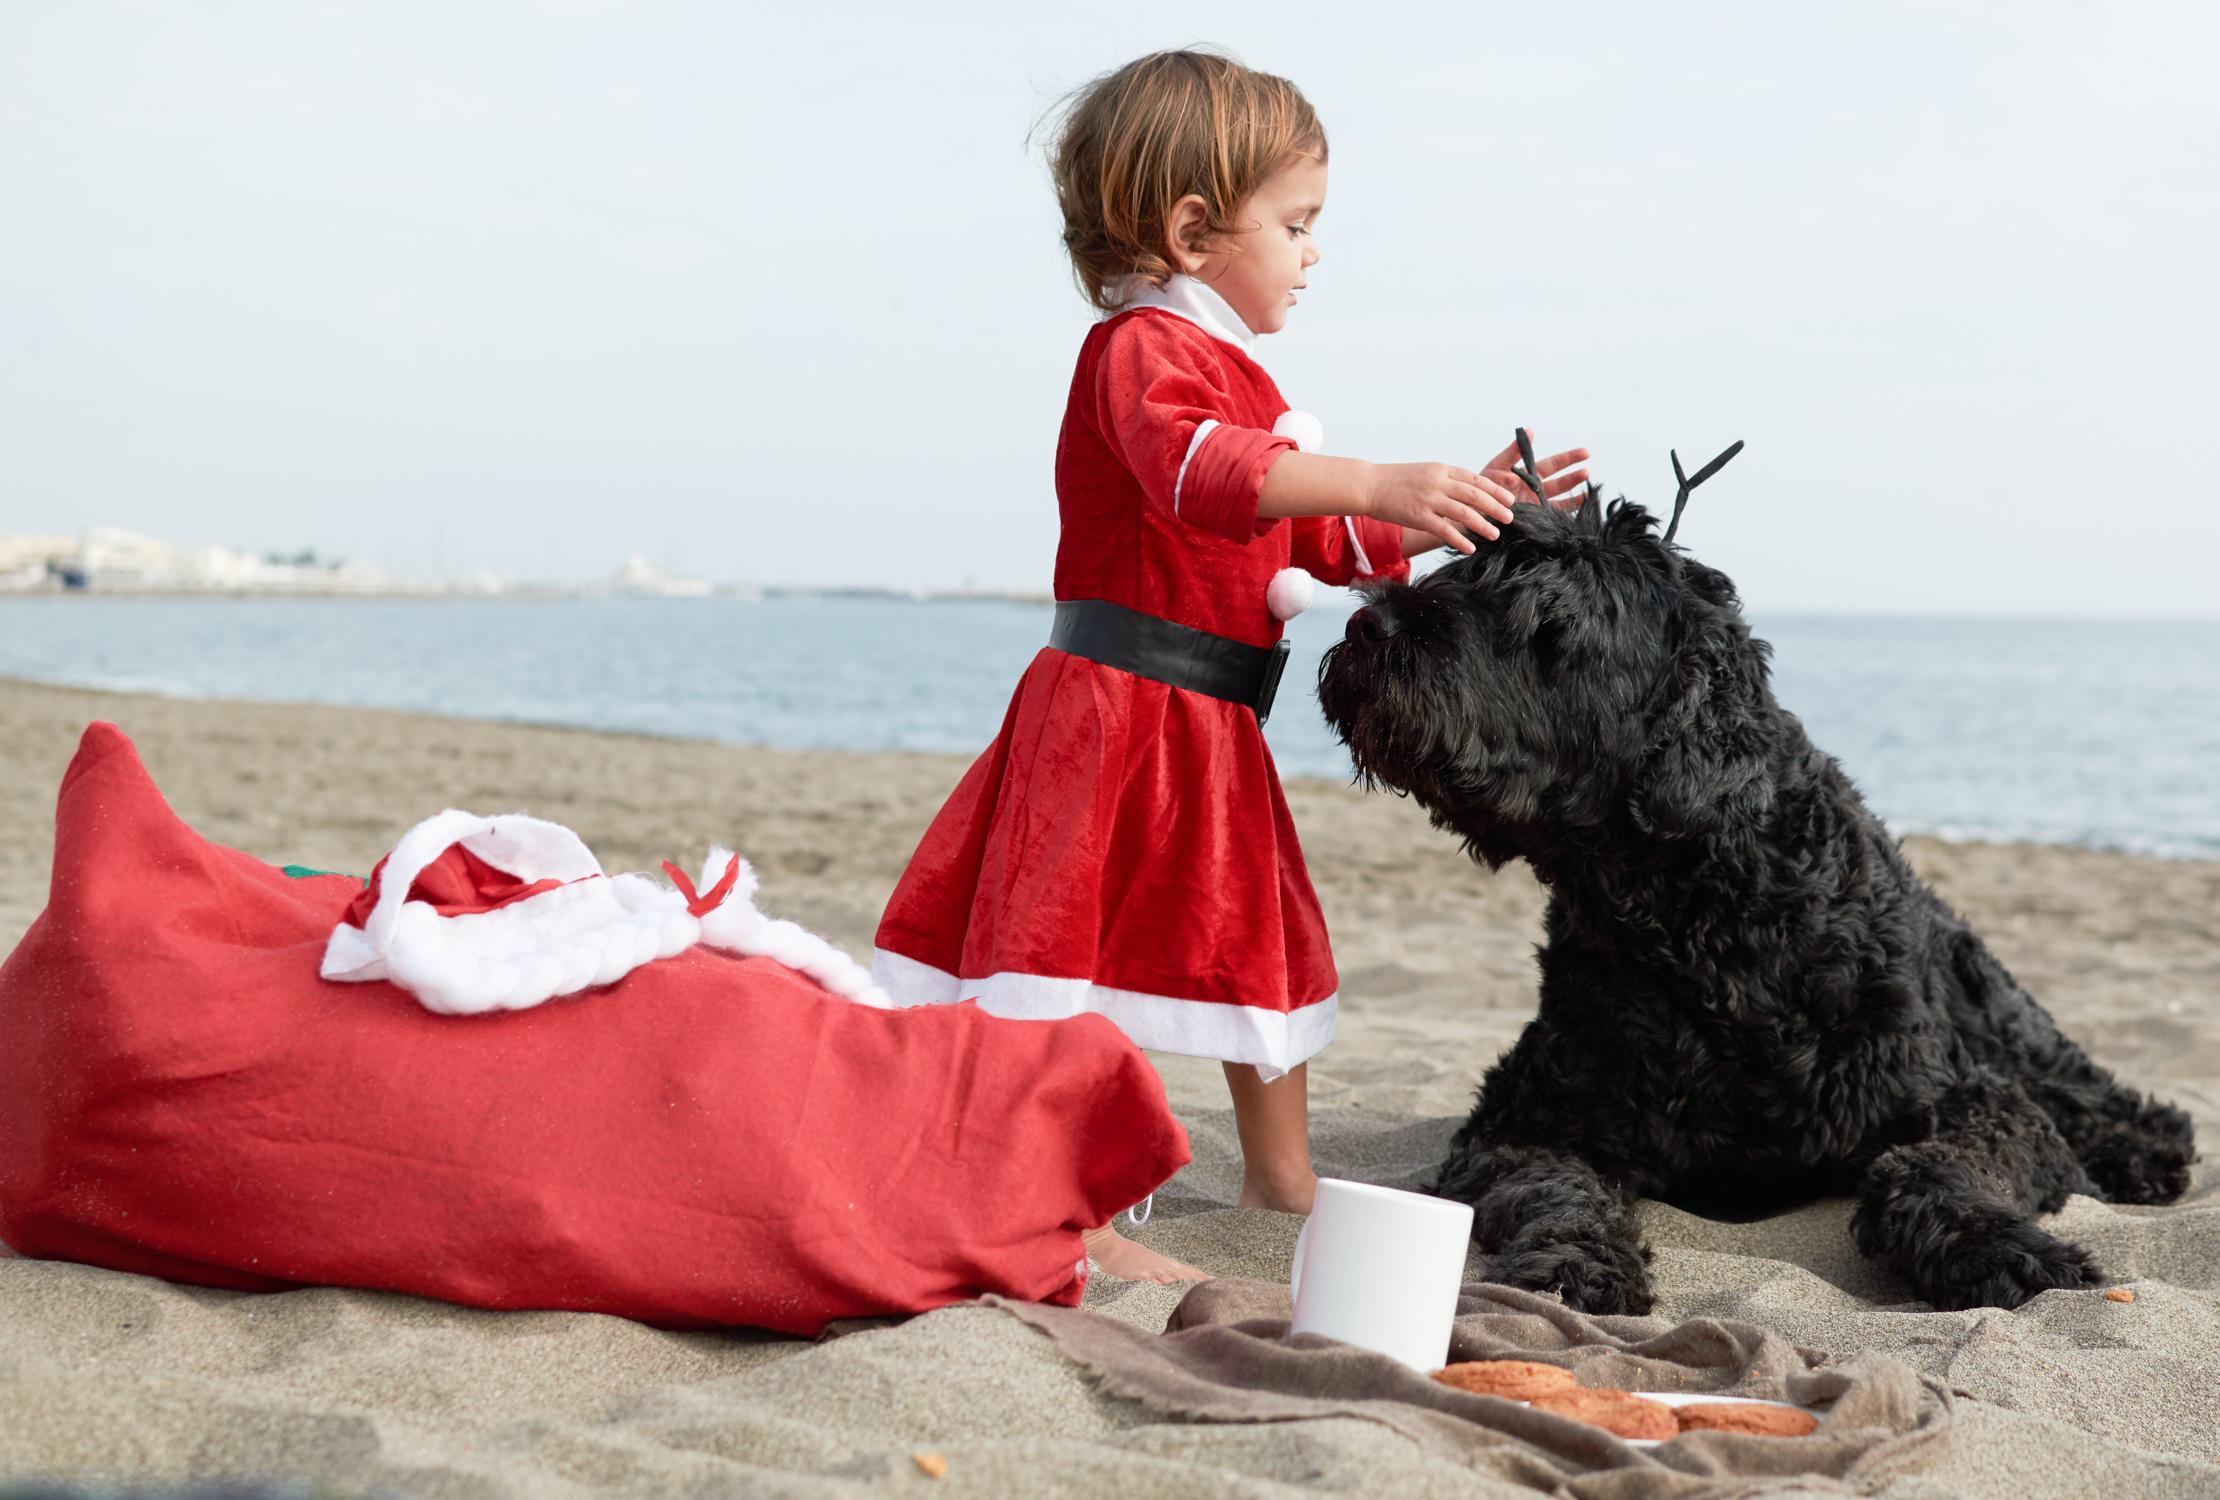 Child_photography_ideas-6